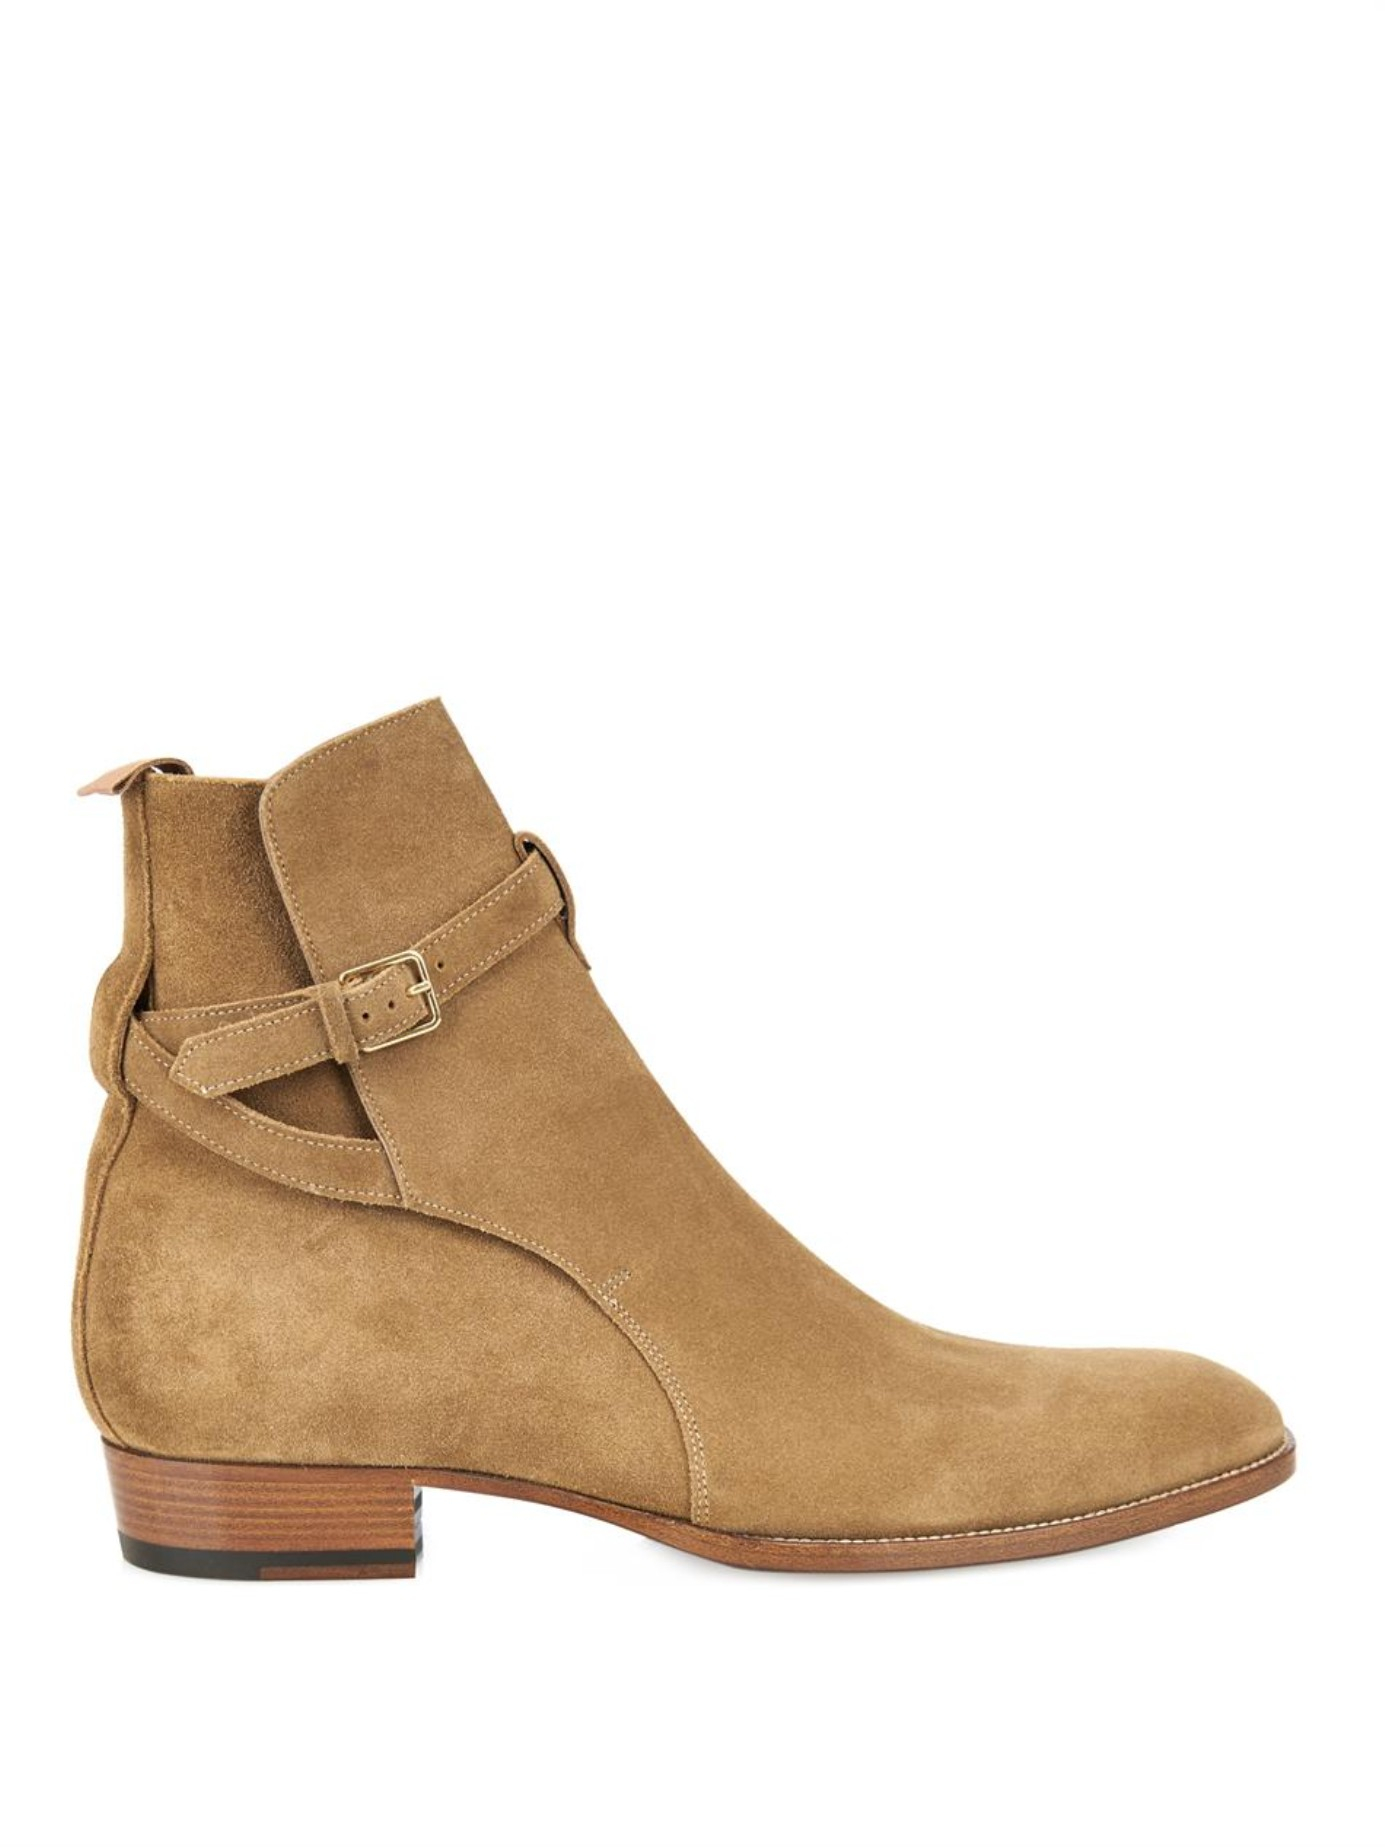 Shoes Natural Small Heel